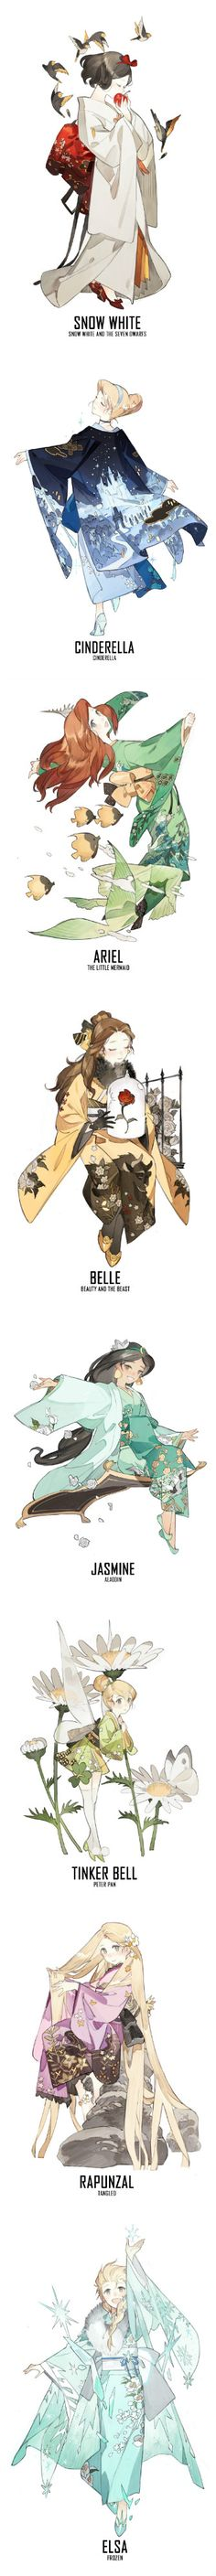 Disney Princesses - Snow White, Cinderella, Ariel, Belle, Jasmine, Tinker Bell, Rapunzel, and Elsa #kimono